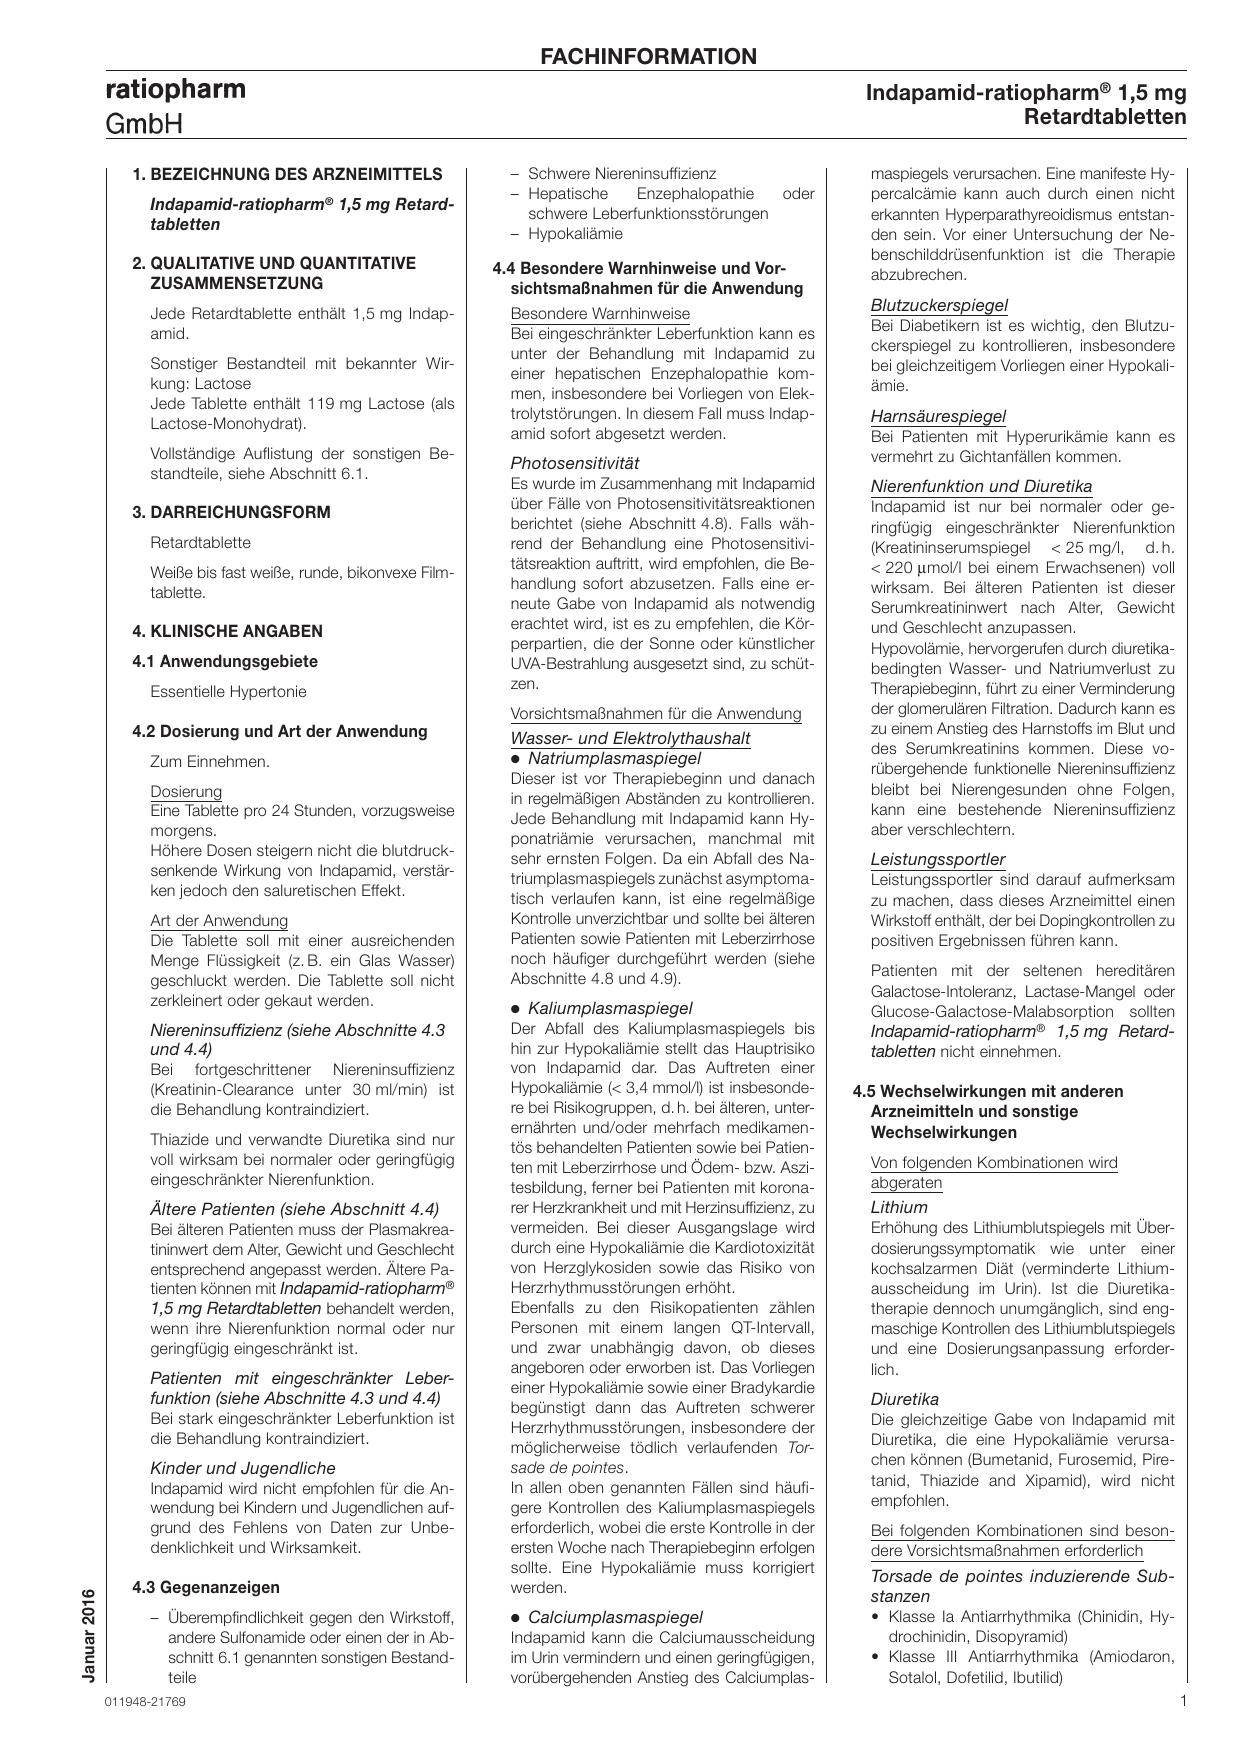 Indapamid-ratiopharm® 1,5 mg Retardtabletten